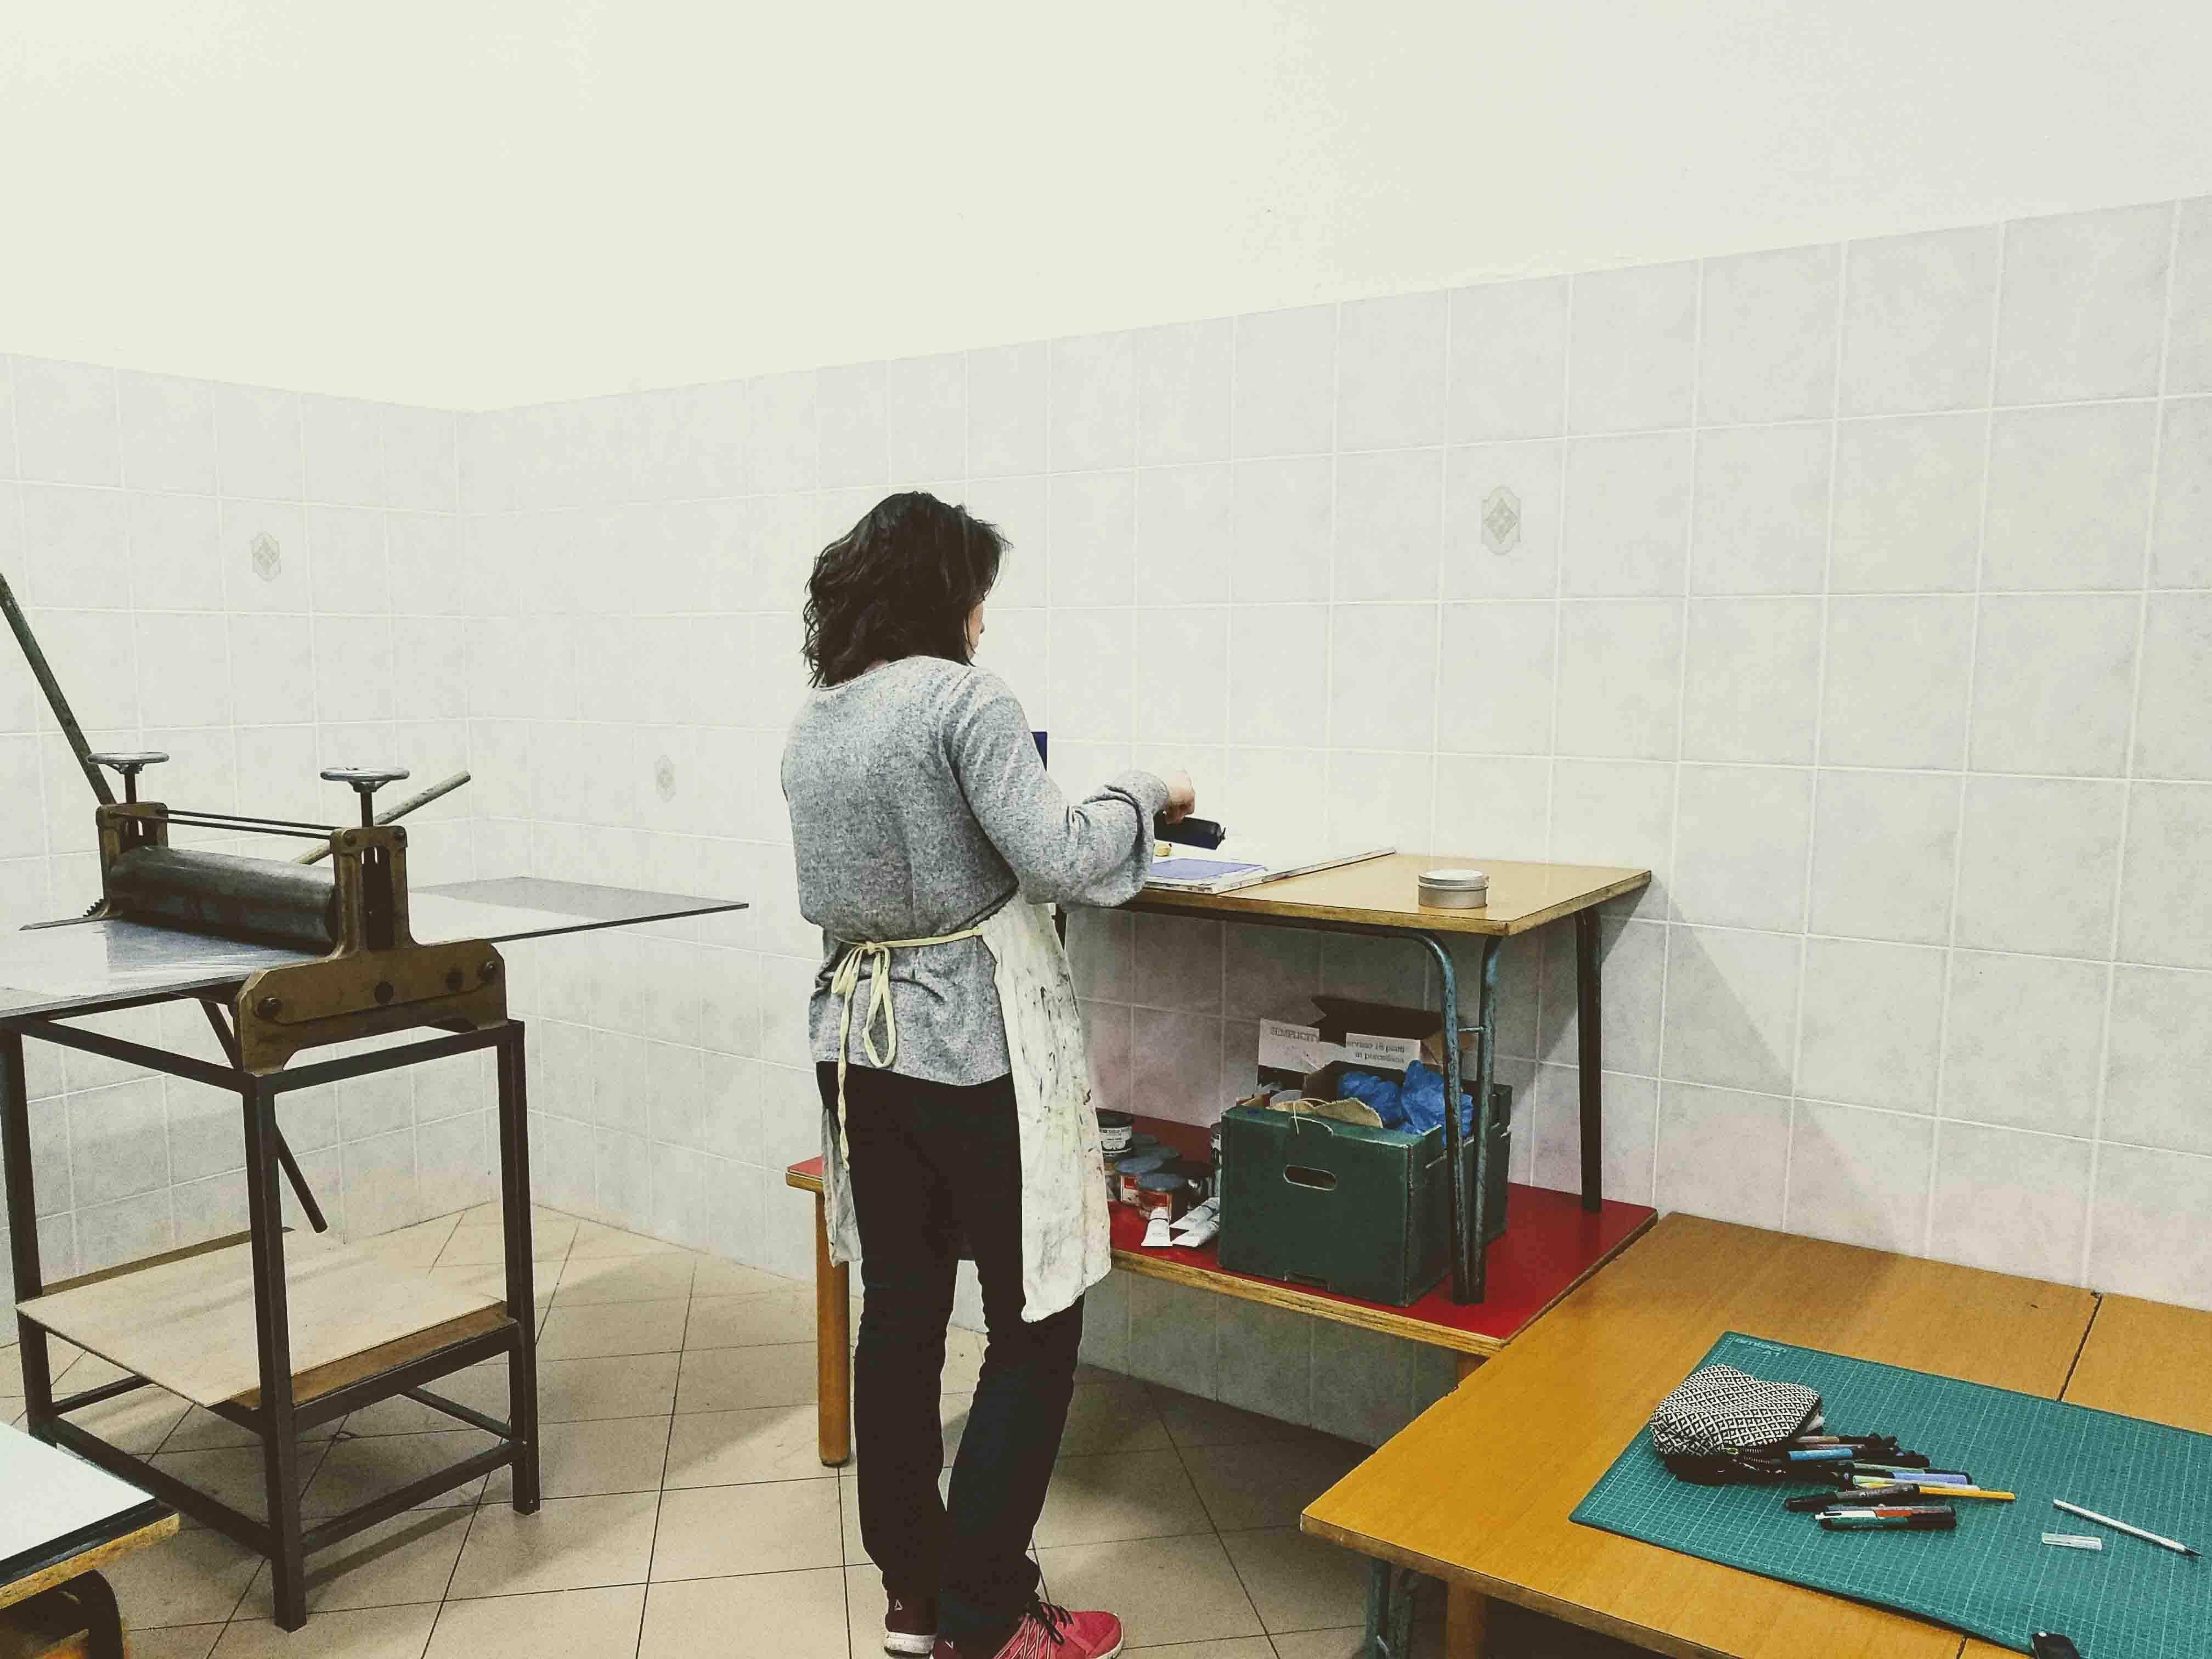 Art Studio Spectrapolis Residenze artistiche sardegna art music incontro artista performance